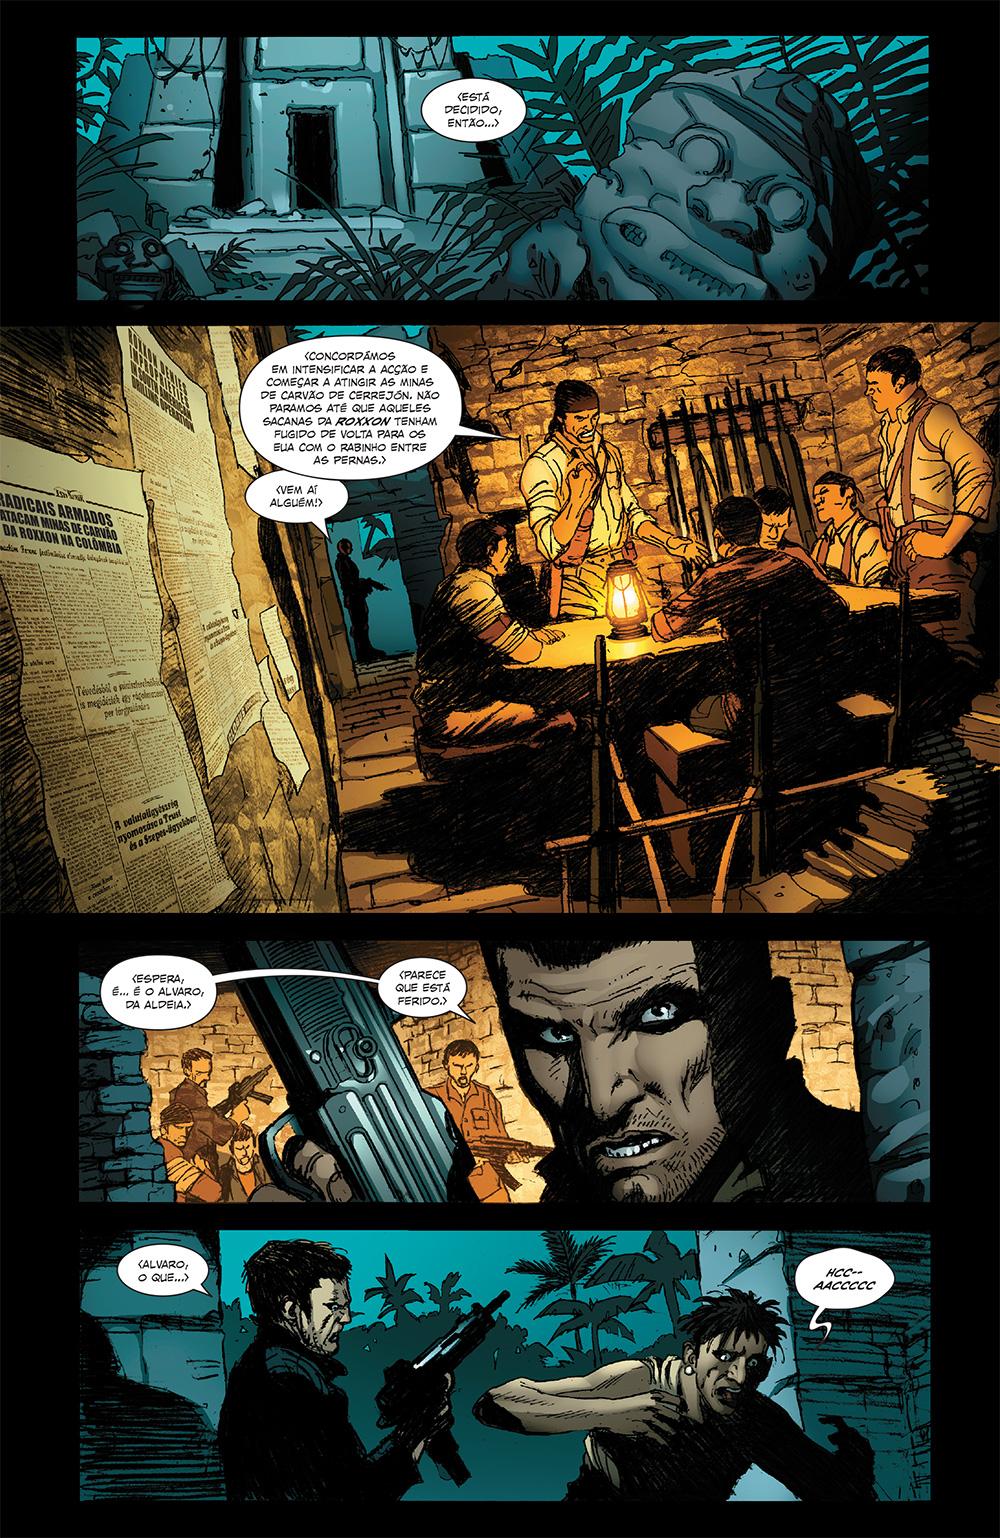 WOLVERINE ARMA X vol. 1: Os Homens de Adamantium